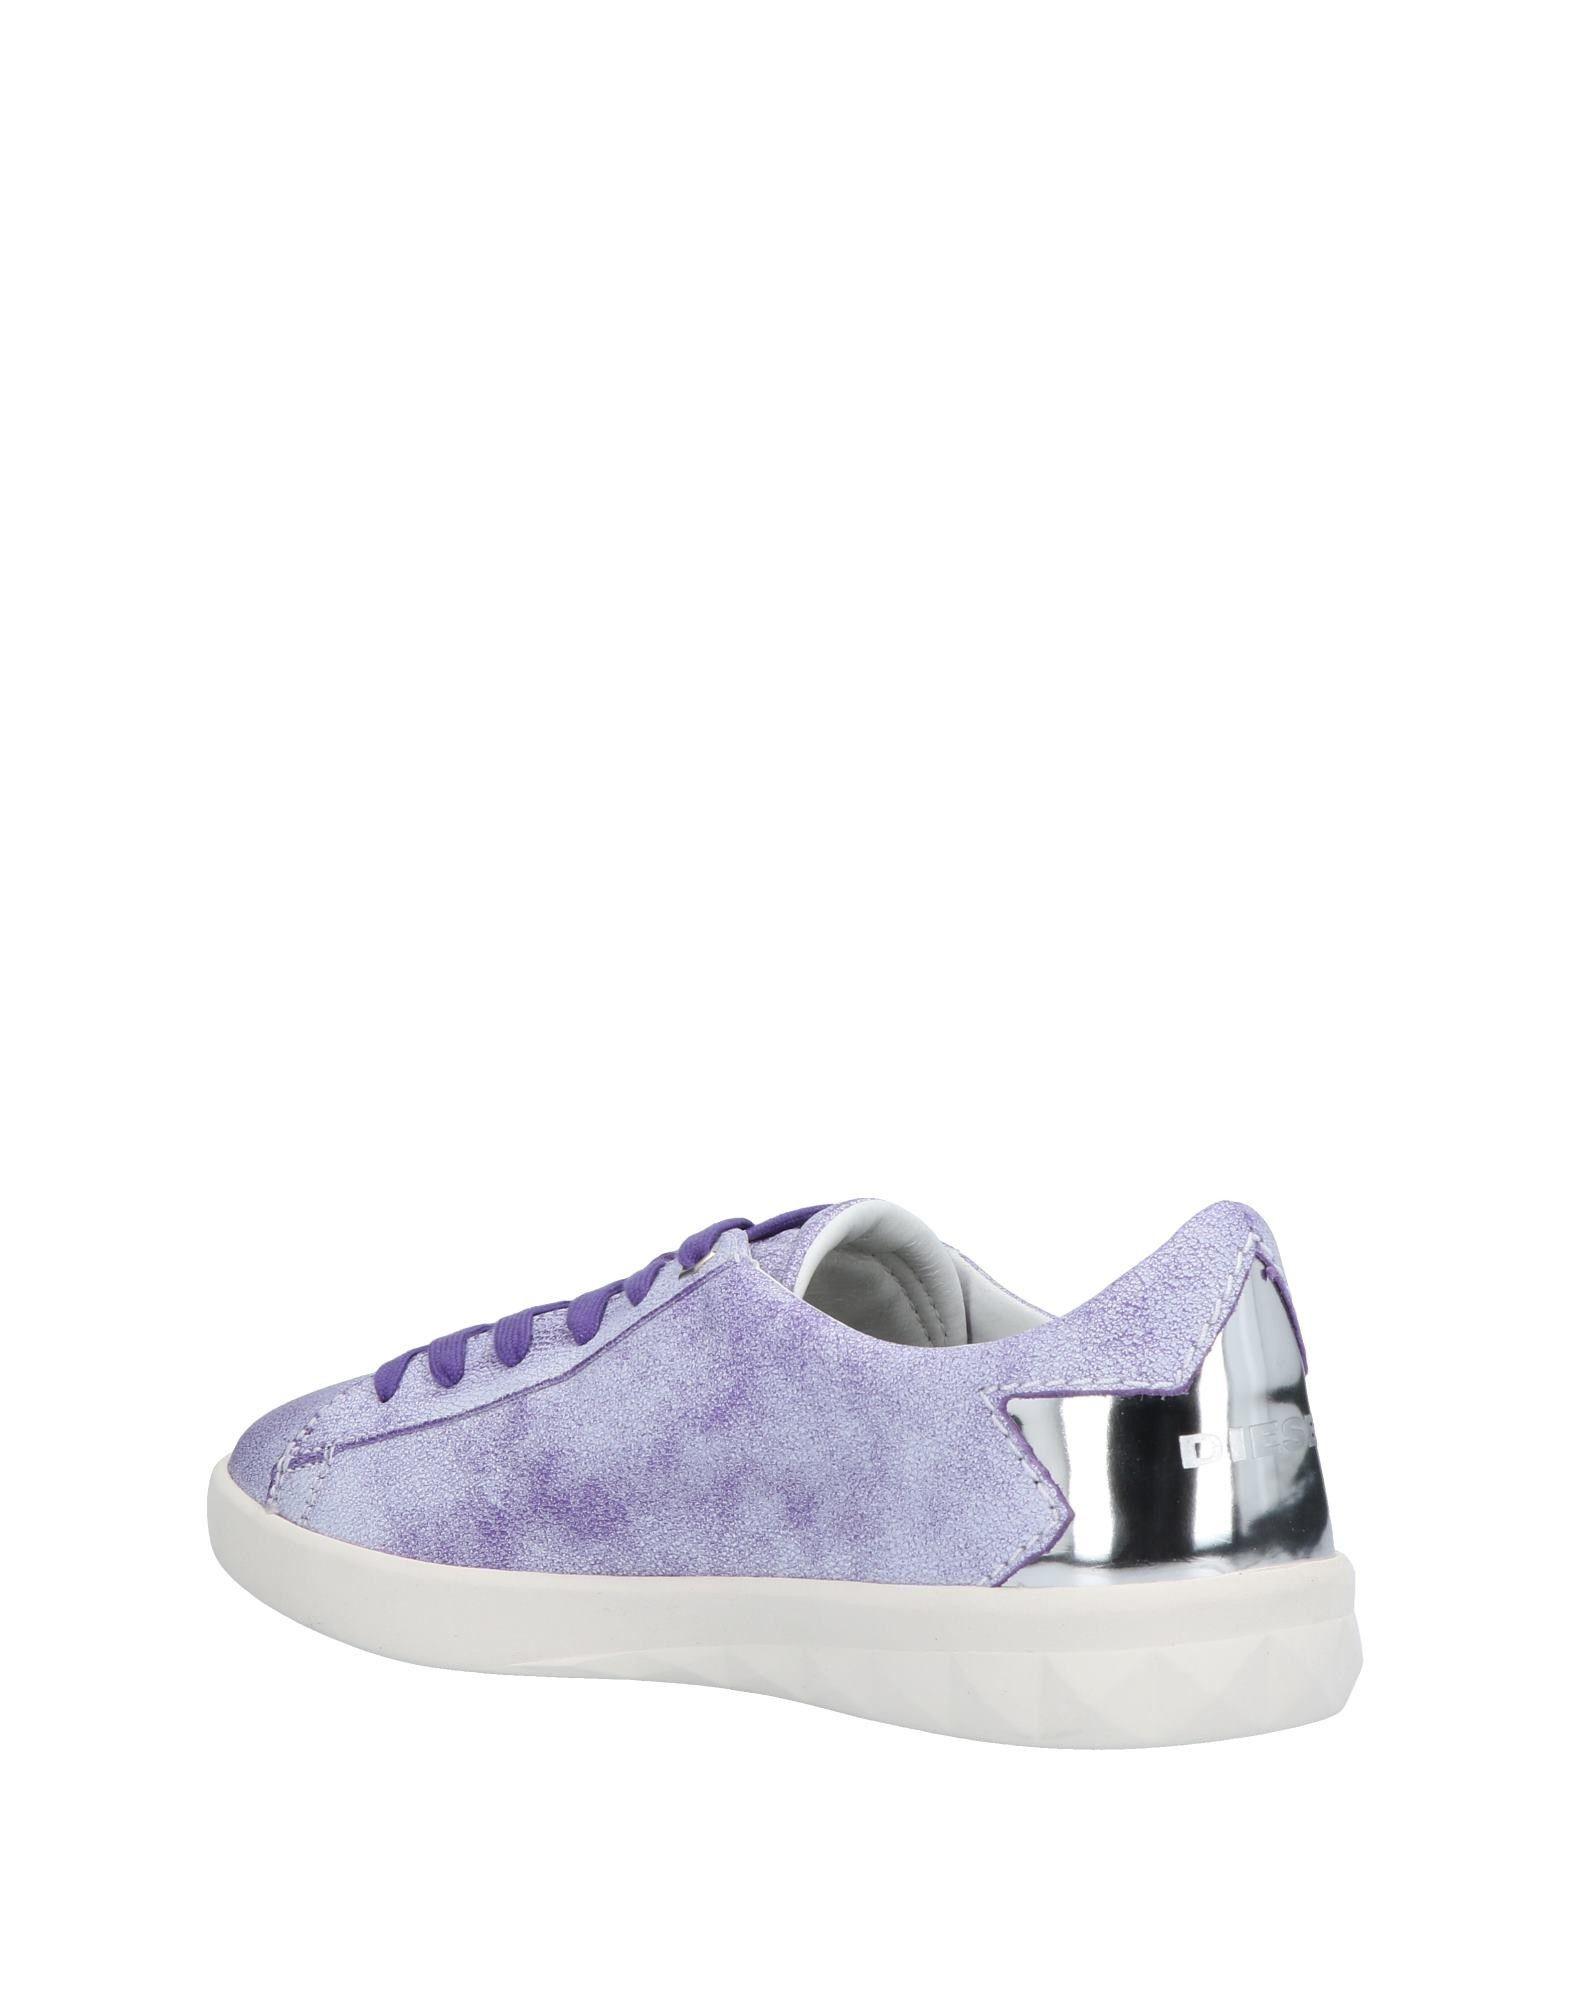 Diesel Sneakers Damen  11423610AI Gute Qualität beliebte Schuhe